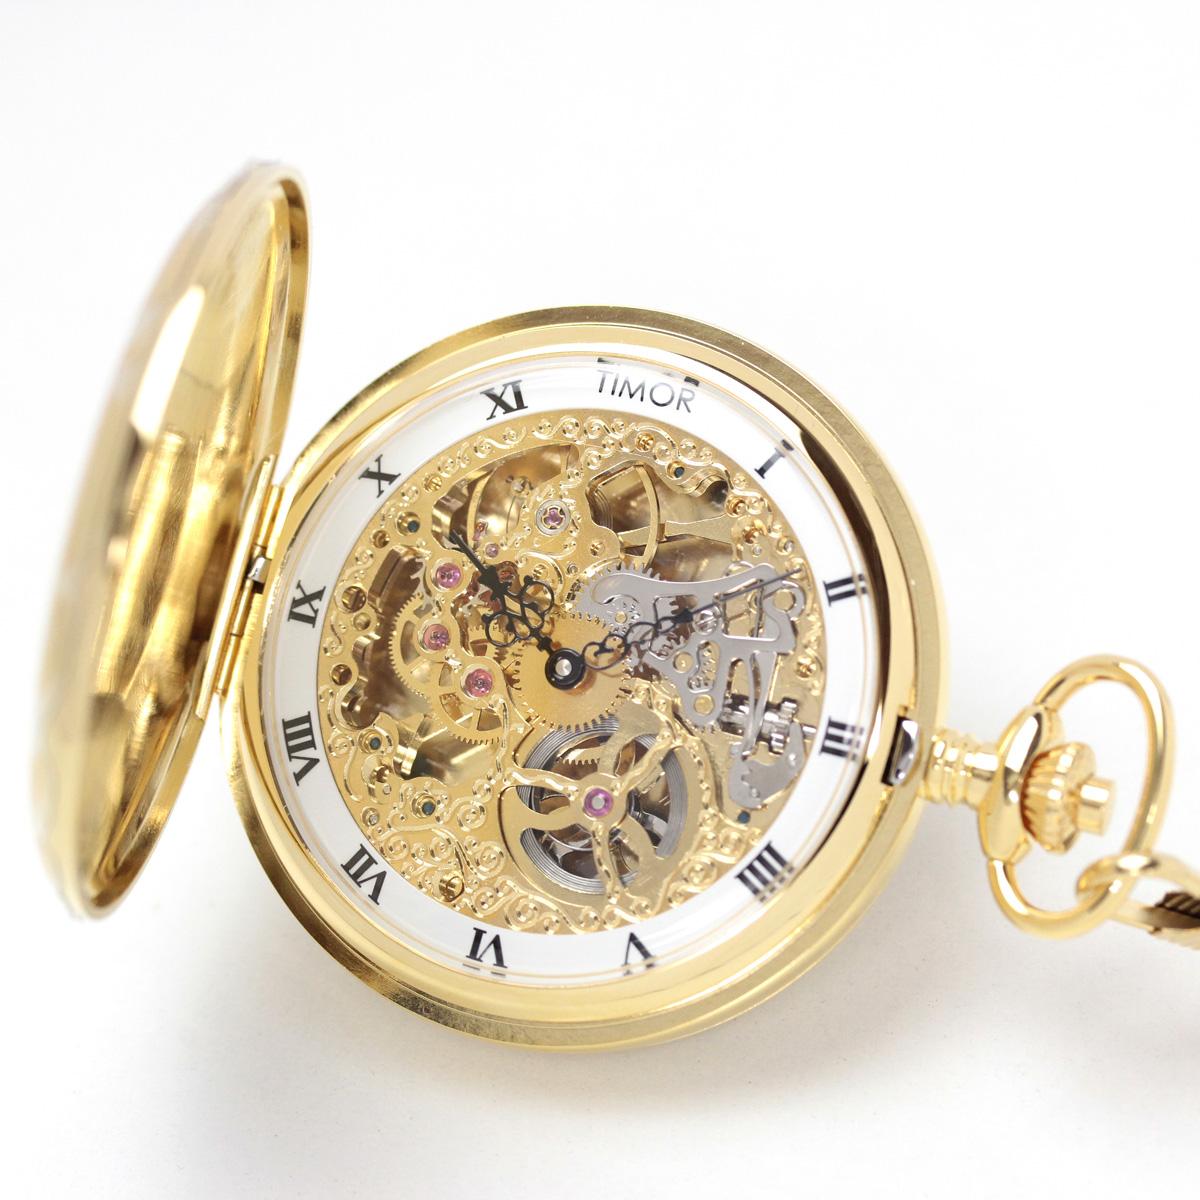 TIMOR/ティモール/フルハンター(両開き)/スケルトン/TP102JA01/ゴールドカラー 懐中時計